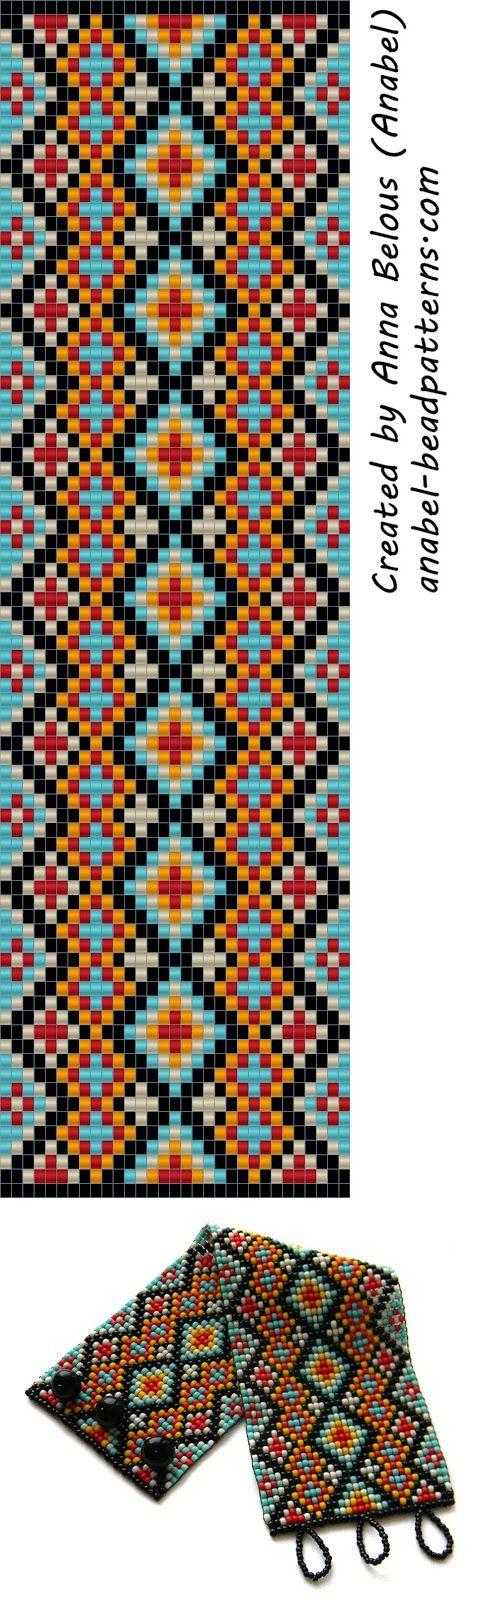 буквами из схема браслета бисера